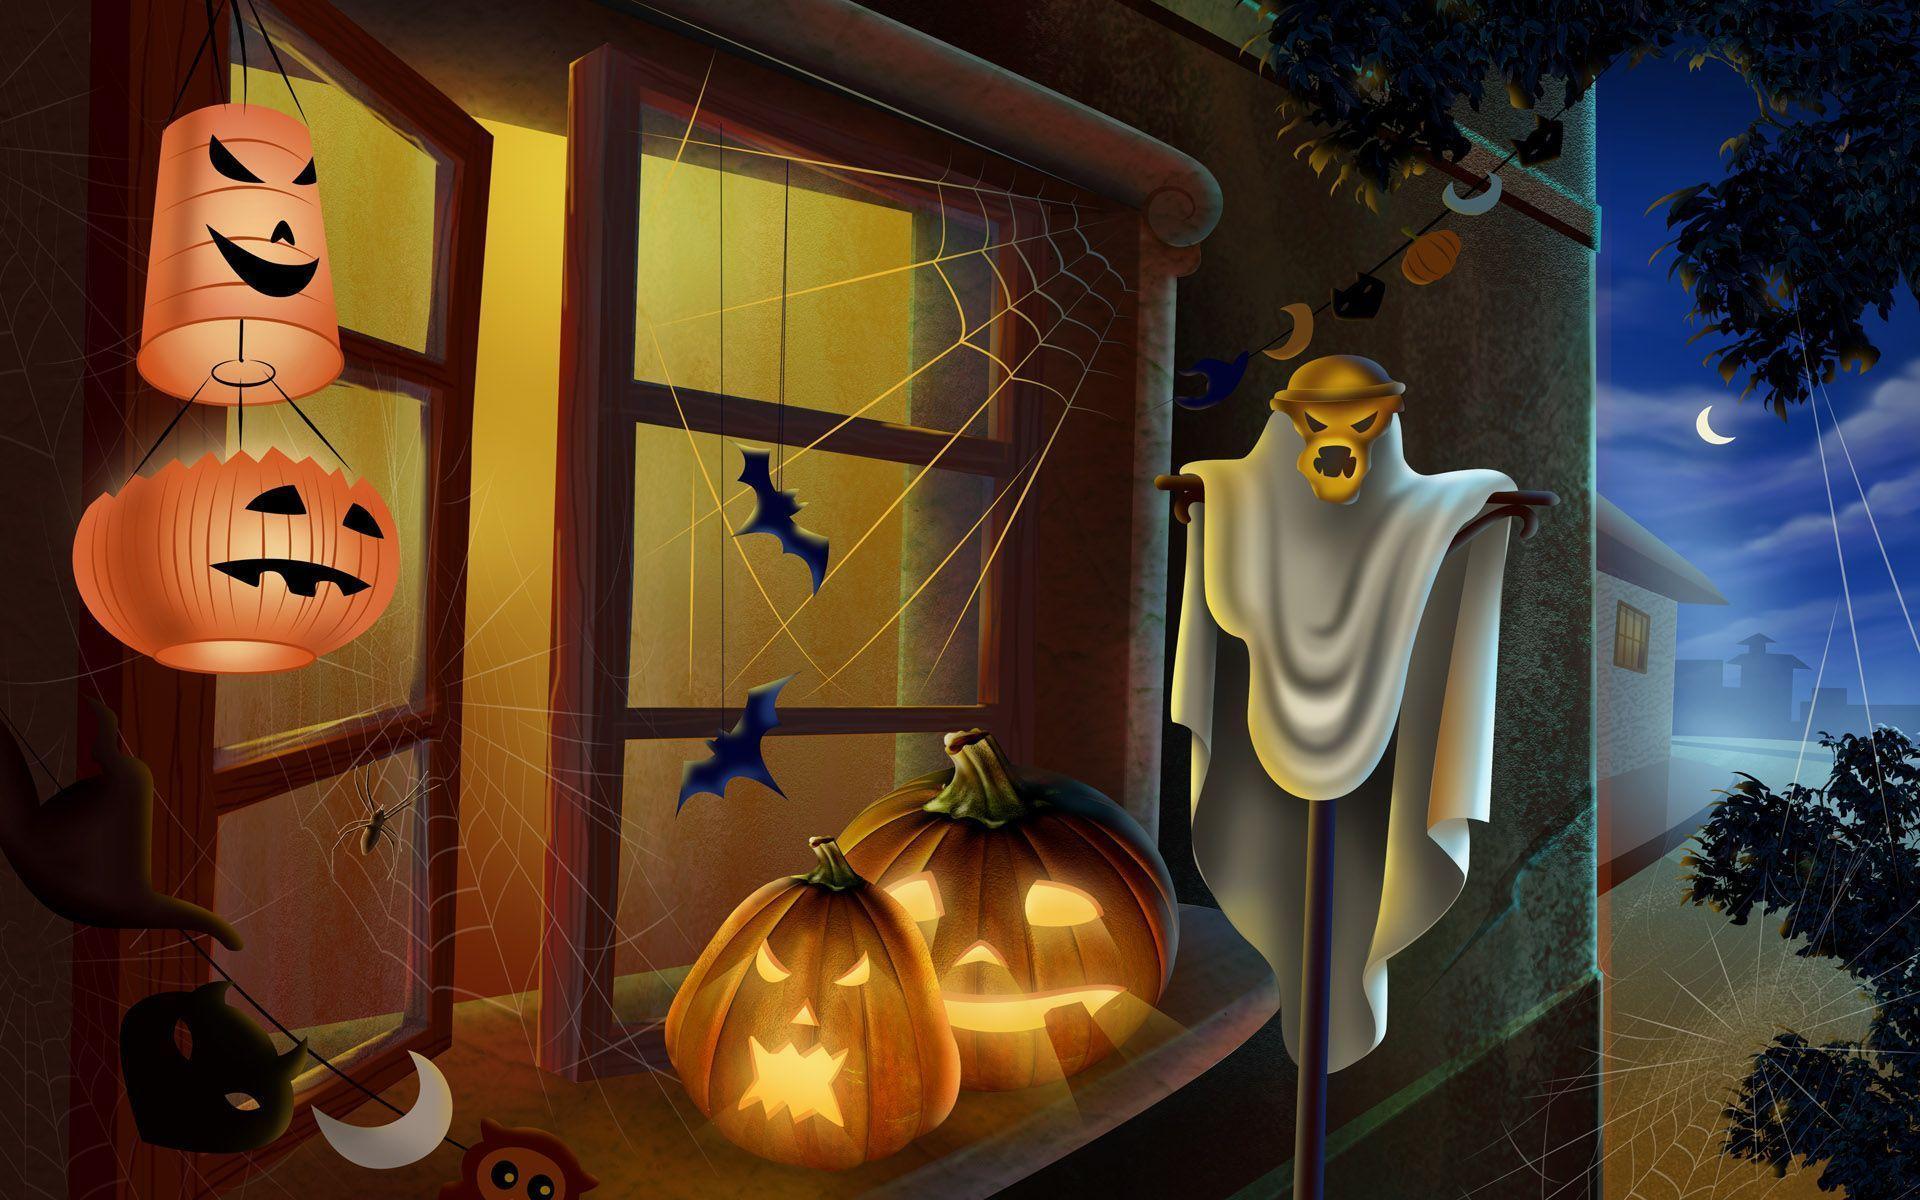 Halloween HD Wallpapers 1080p - HD Wallpapers Inn